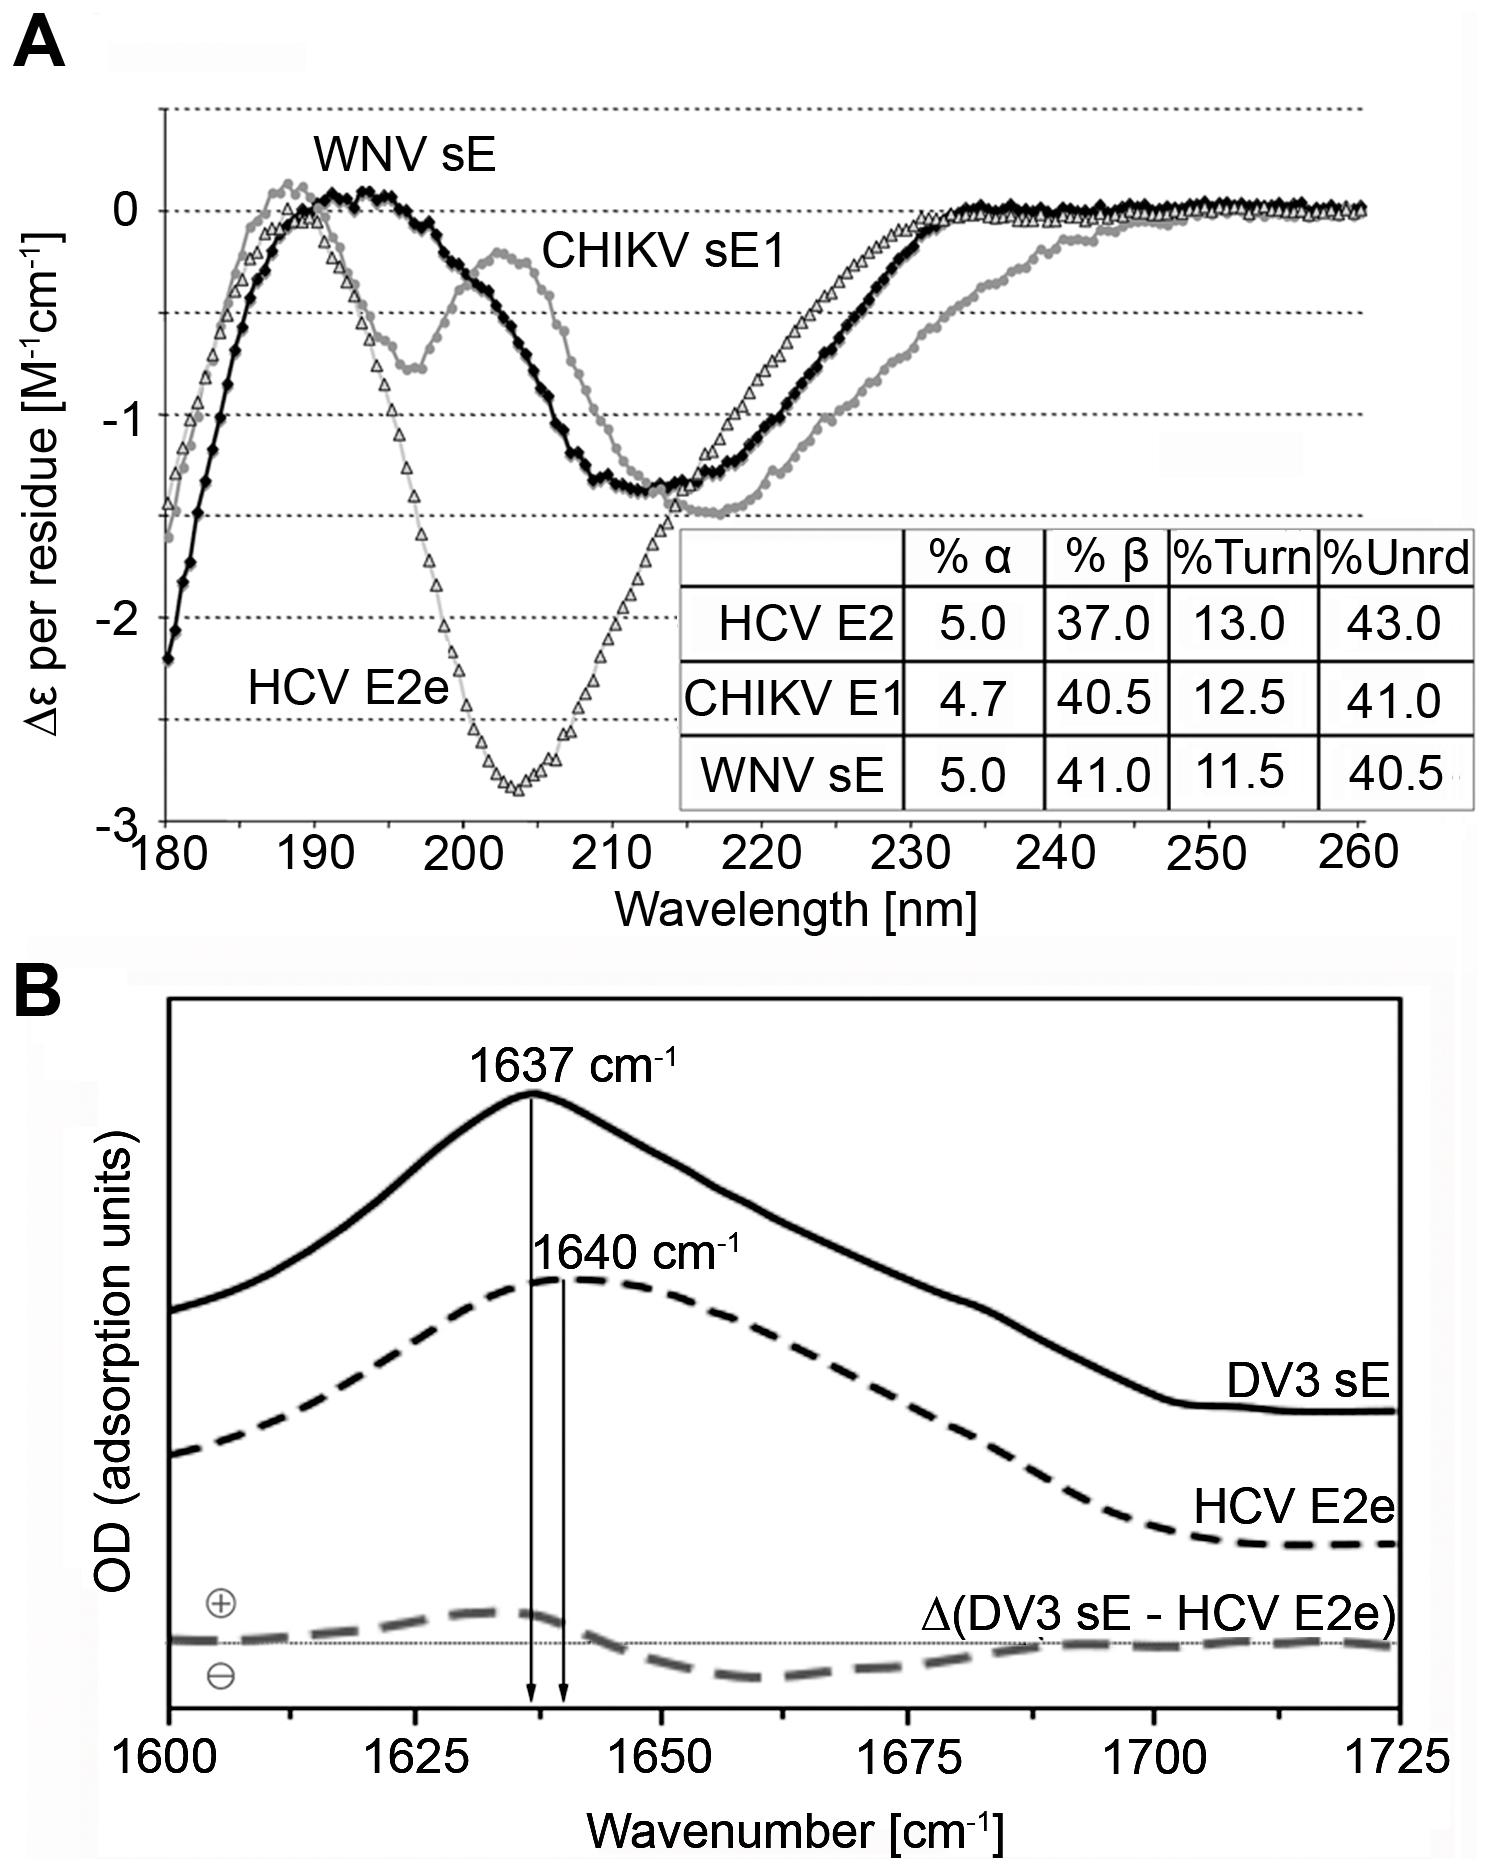 Experimental analysis of the secondary structure of HCV E2e.